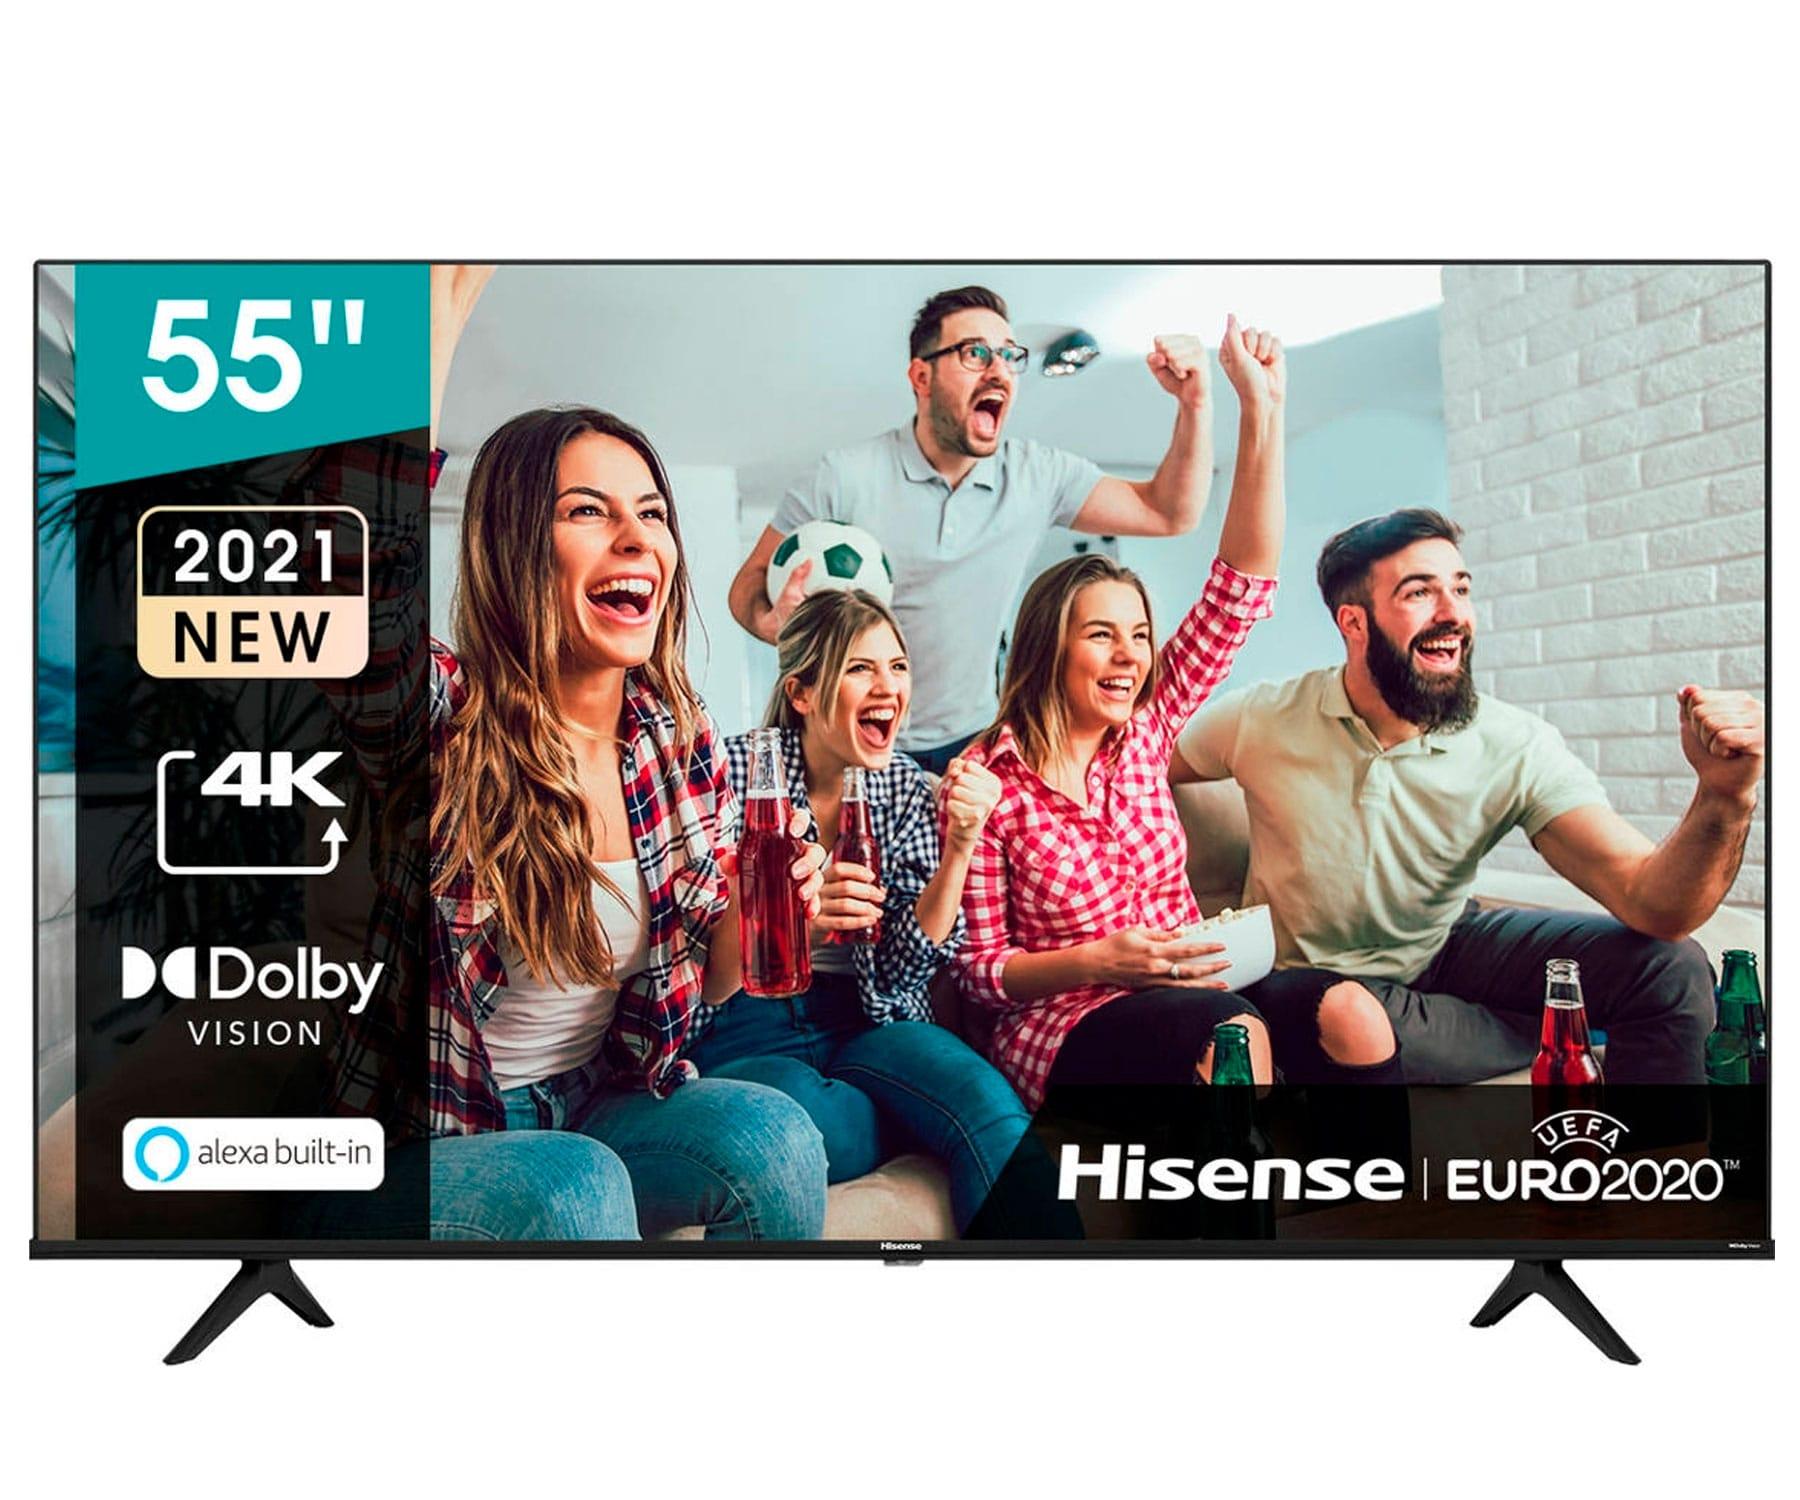 HISENSE 55A6G TELEVISOR SMART TV 55'' UHD 4K HDR